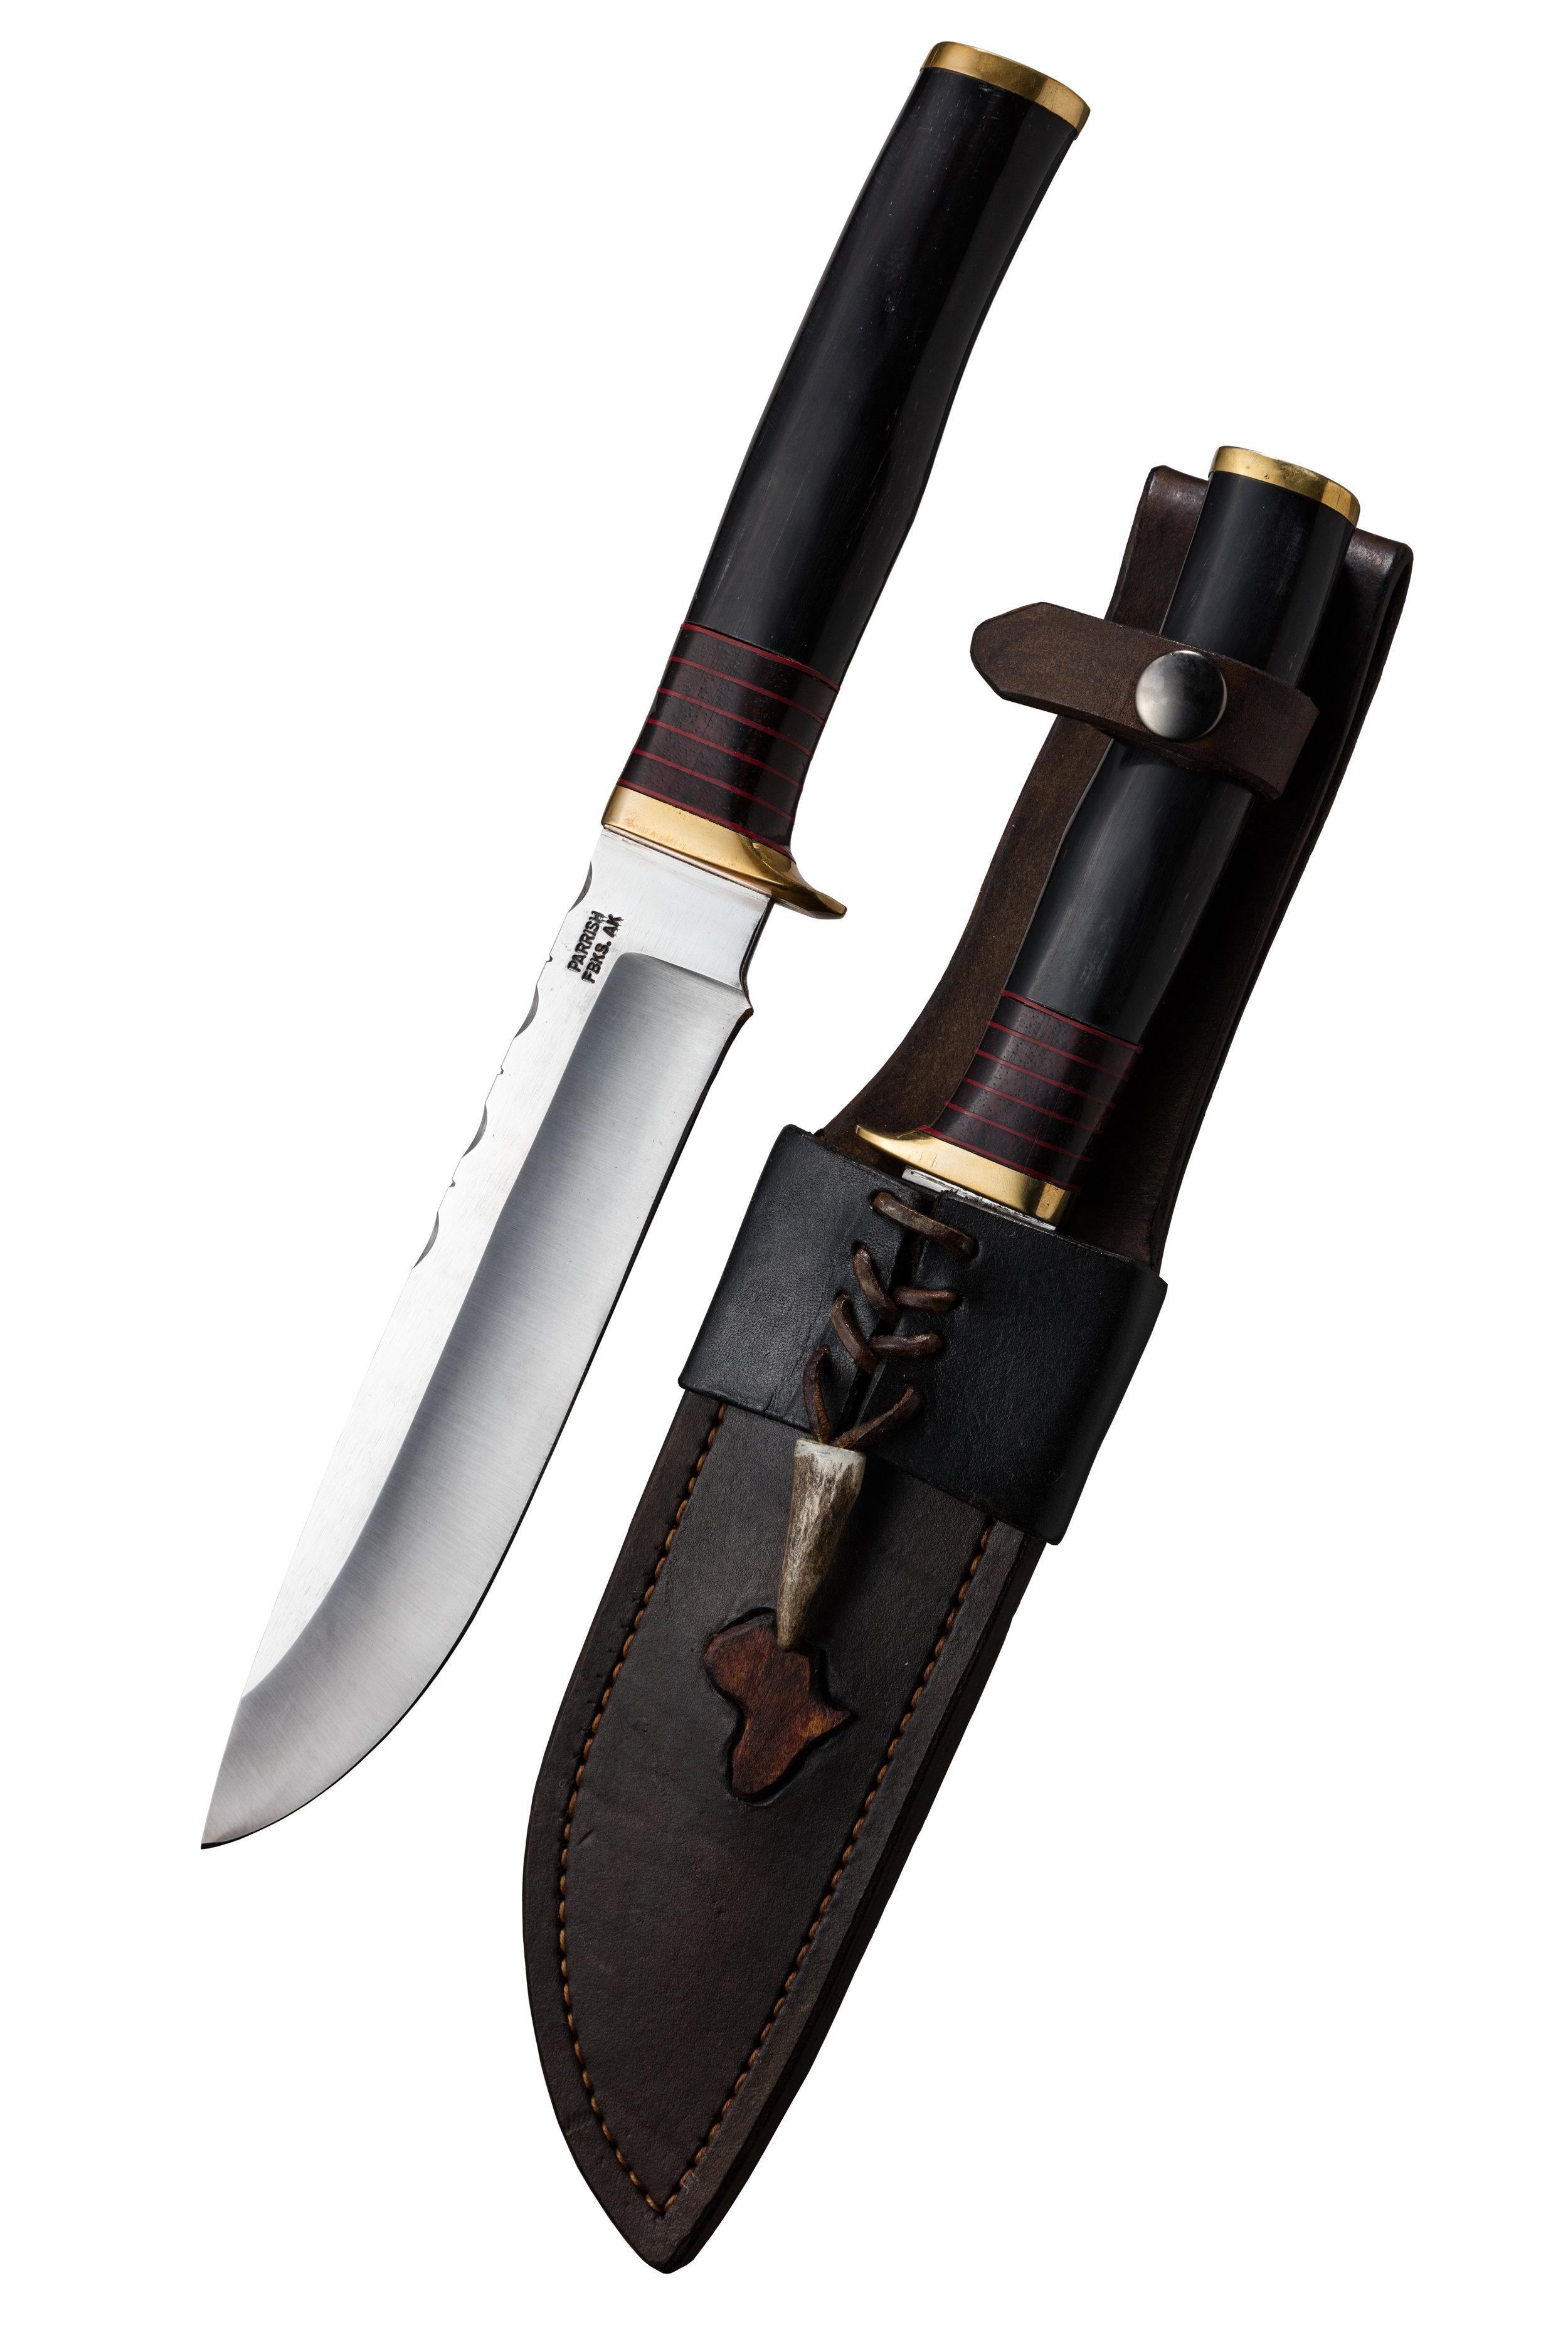 (001 of 006) - Knives (1 of 6).jpg